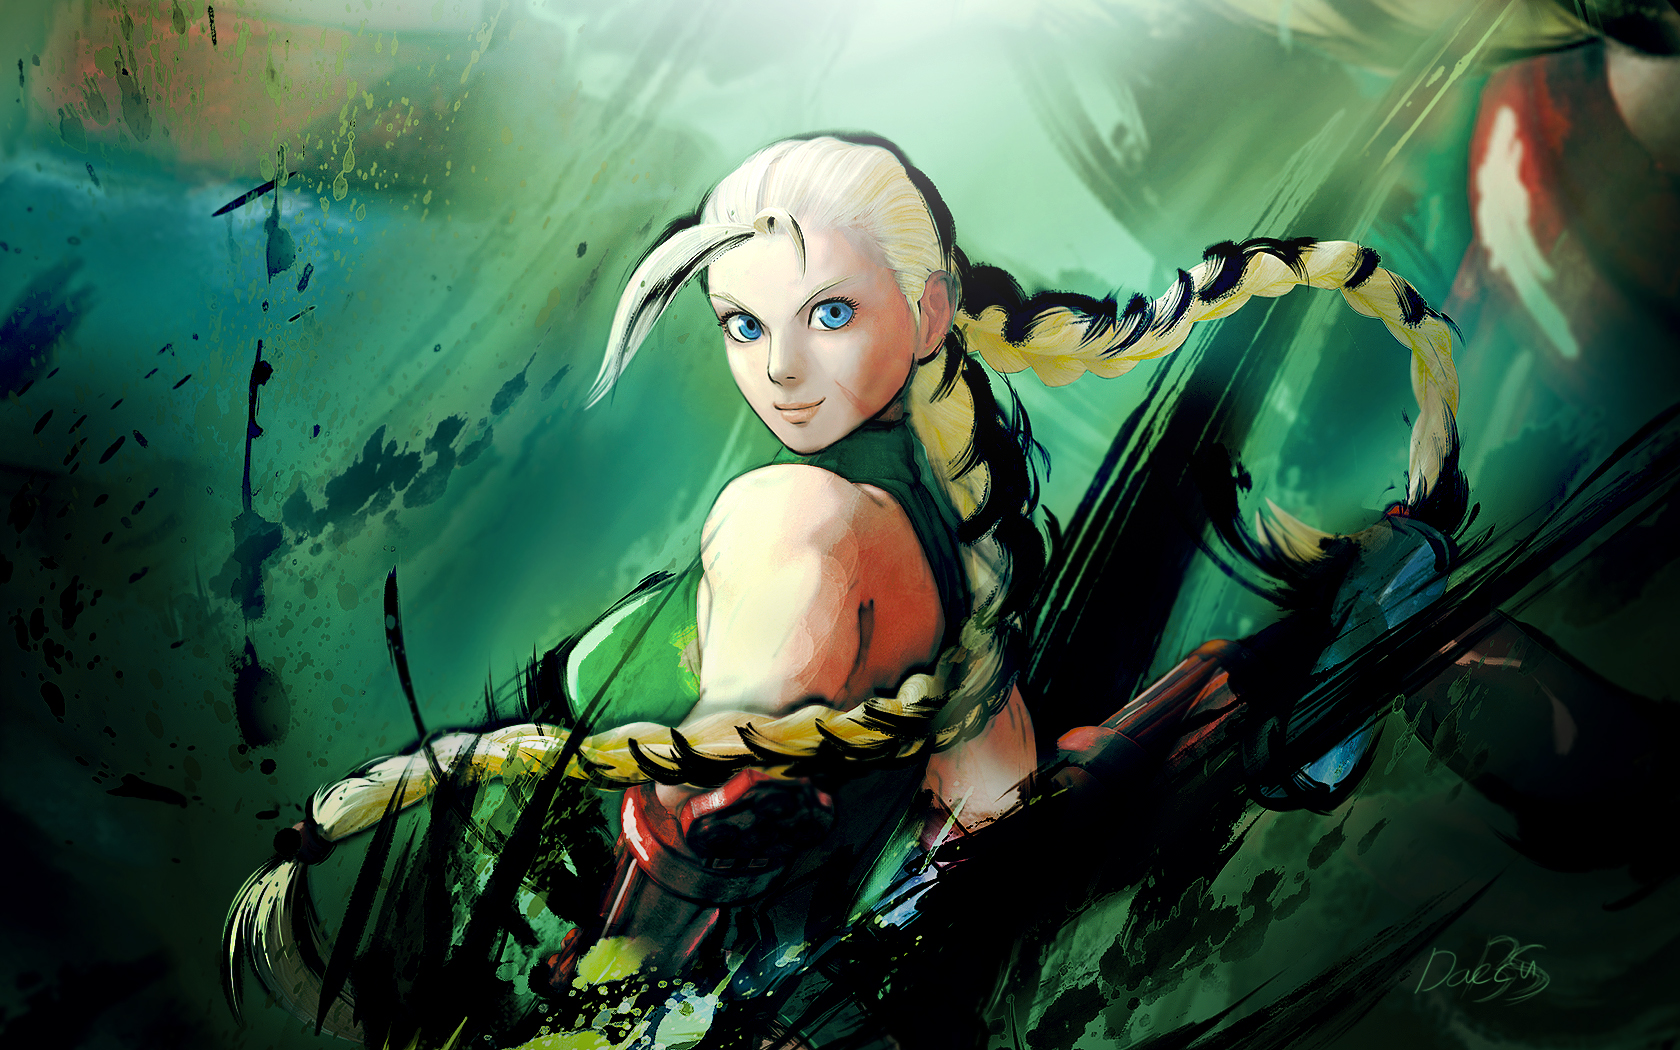 Cammy White, Wallpaper - Zerochan Anime Image Board